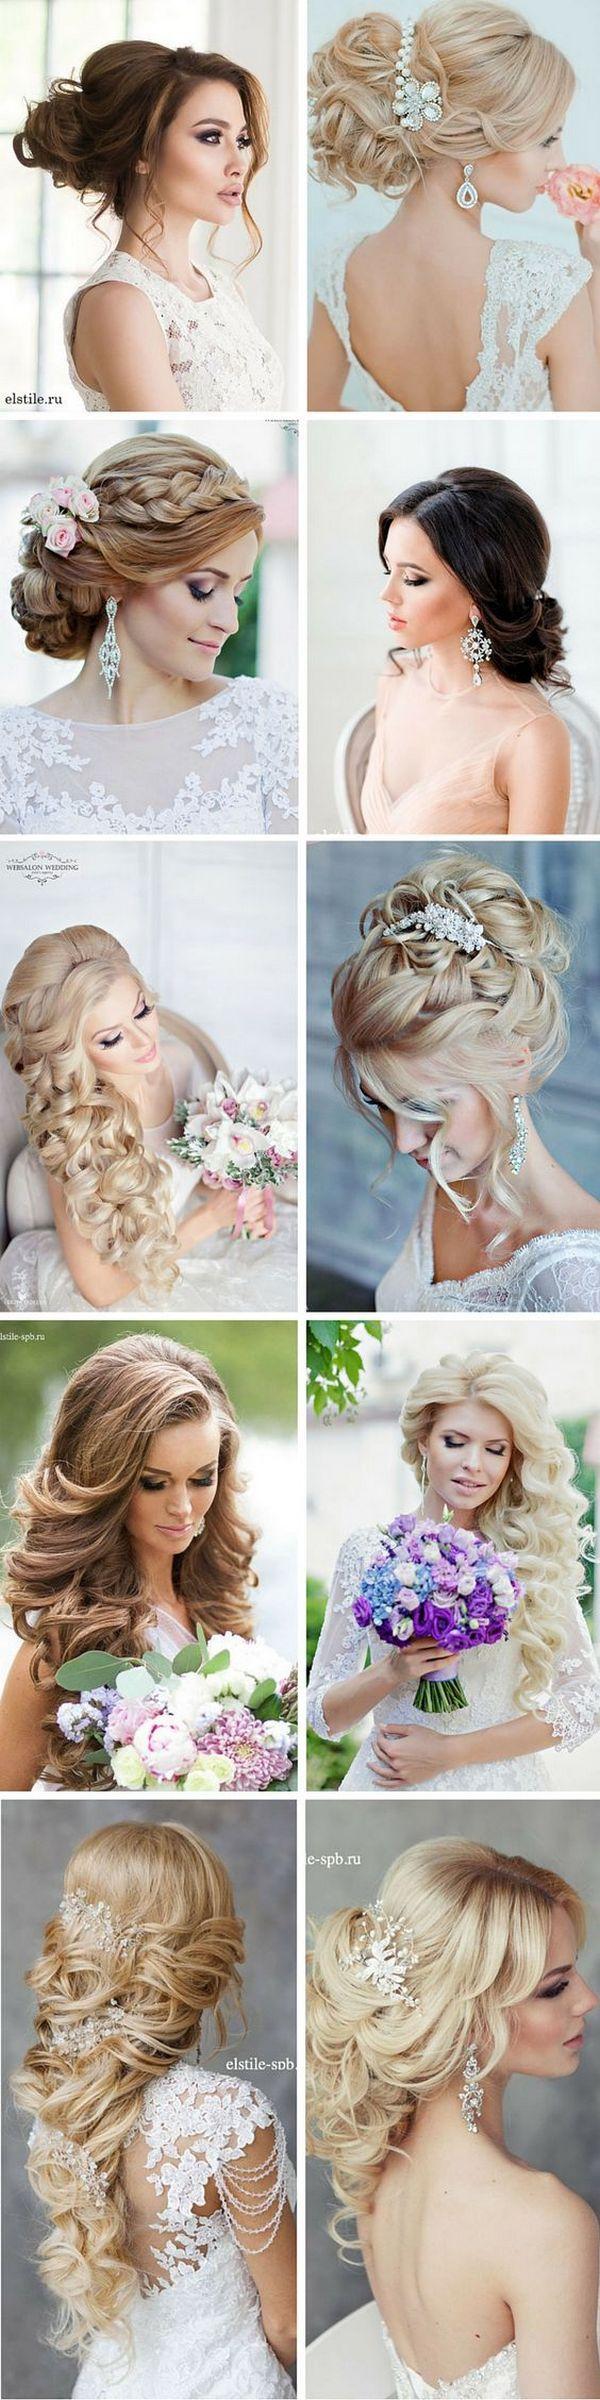 Stunning Summer Wedding Hairstyles / http://www.himisspuff.com/bridal-wedding-hairstyles-for-long-hair/